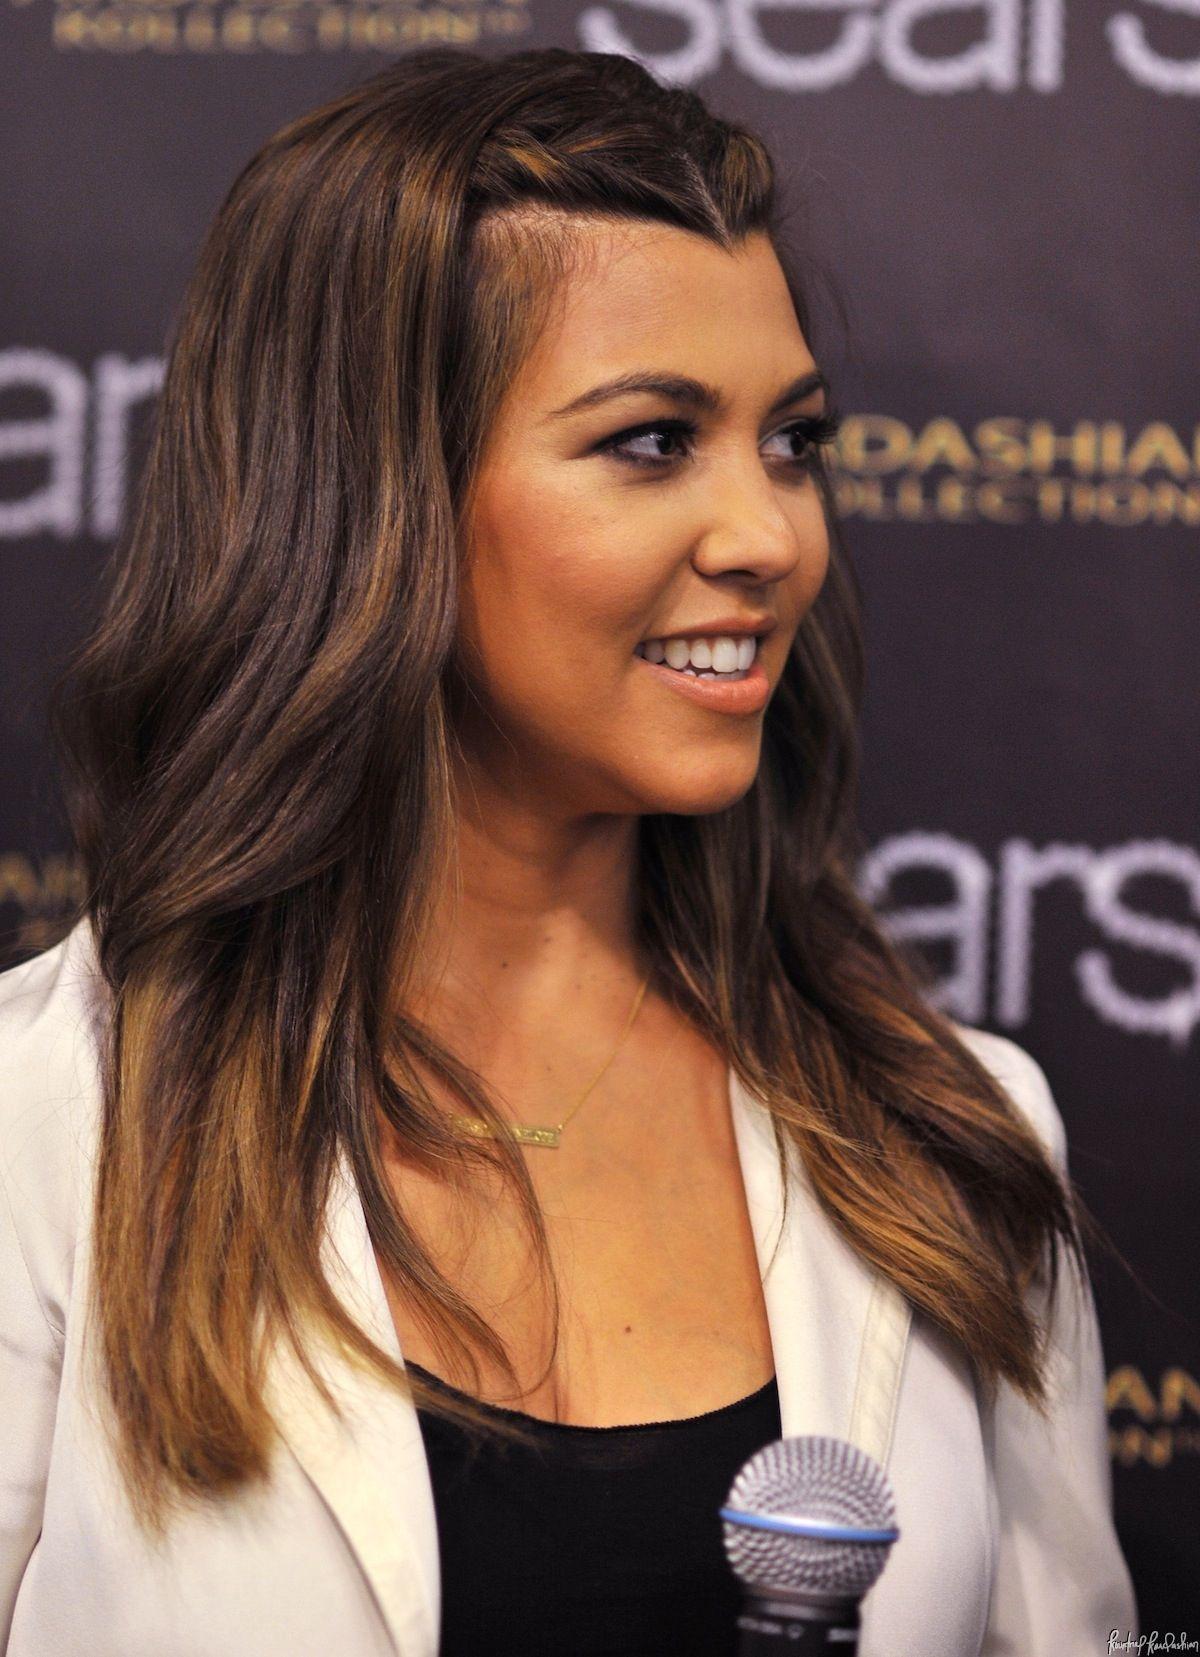 Hair color Kourtney Kardashian  styles  Pinterest  Kourtney